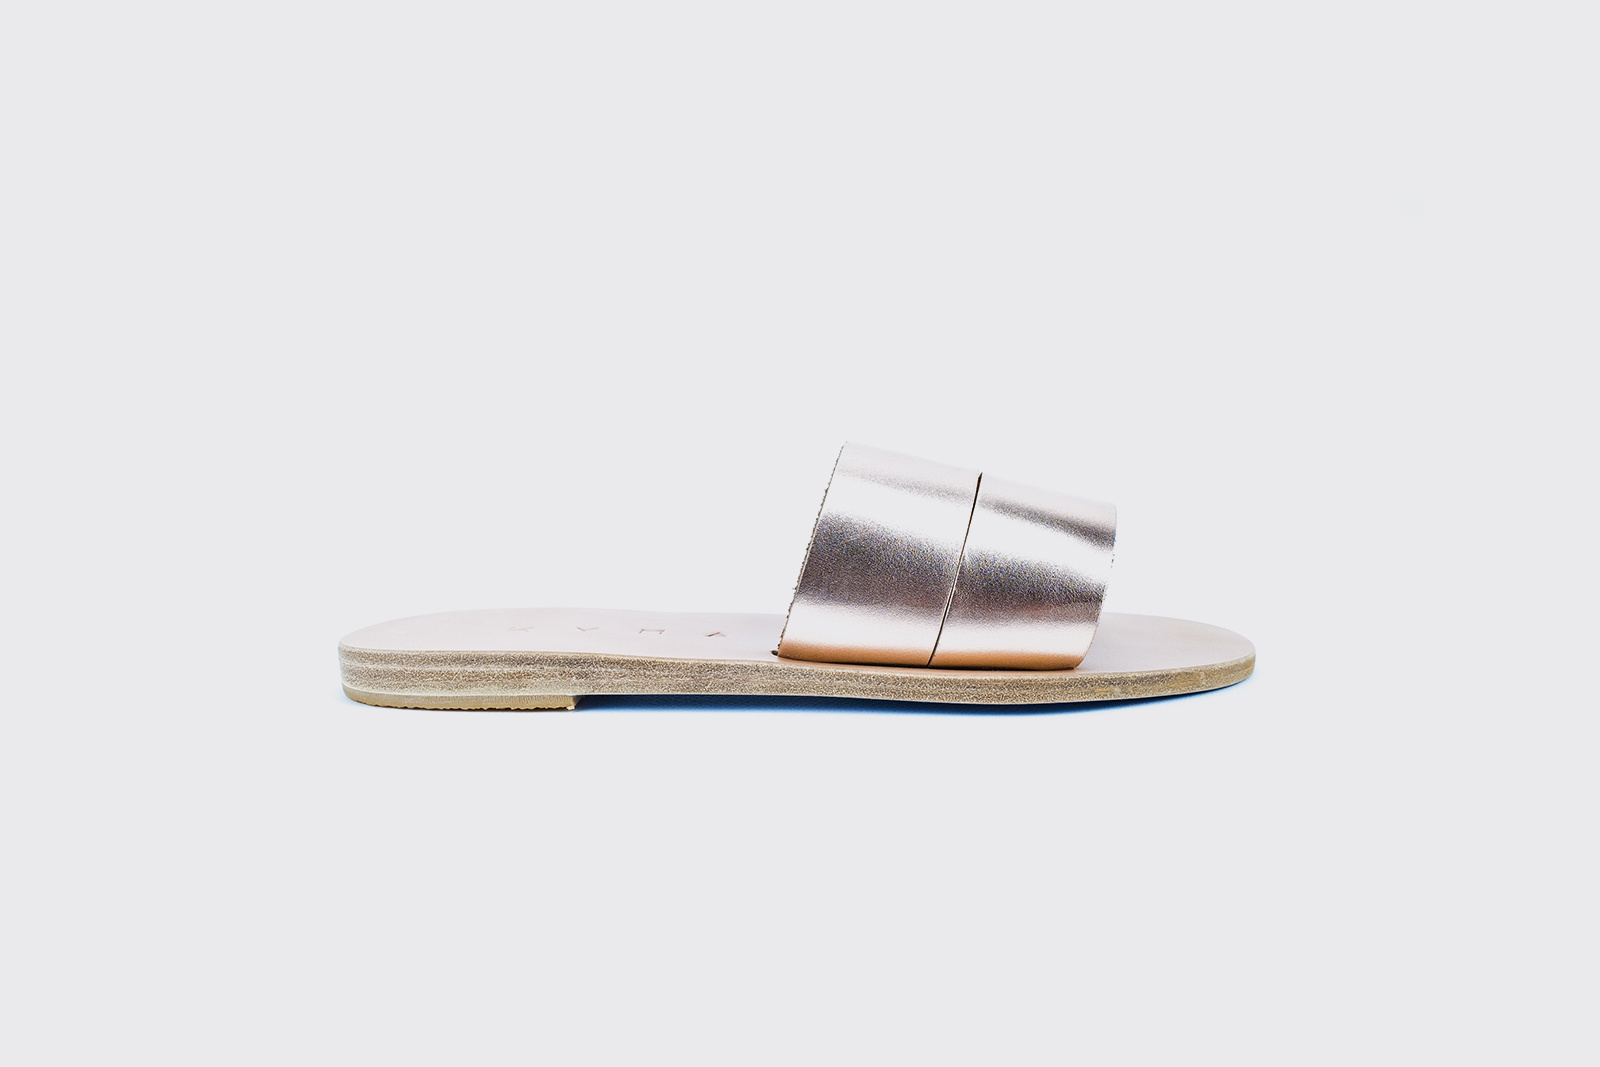 Kyma Kithira Greek Sandals in Bronze/Natural